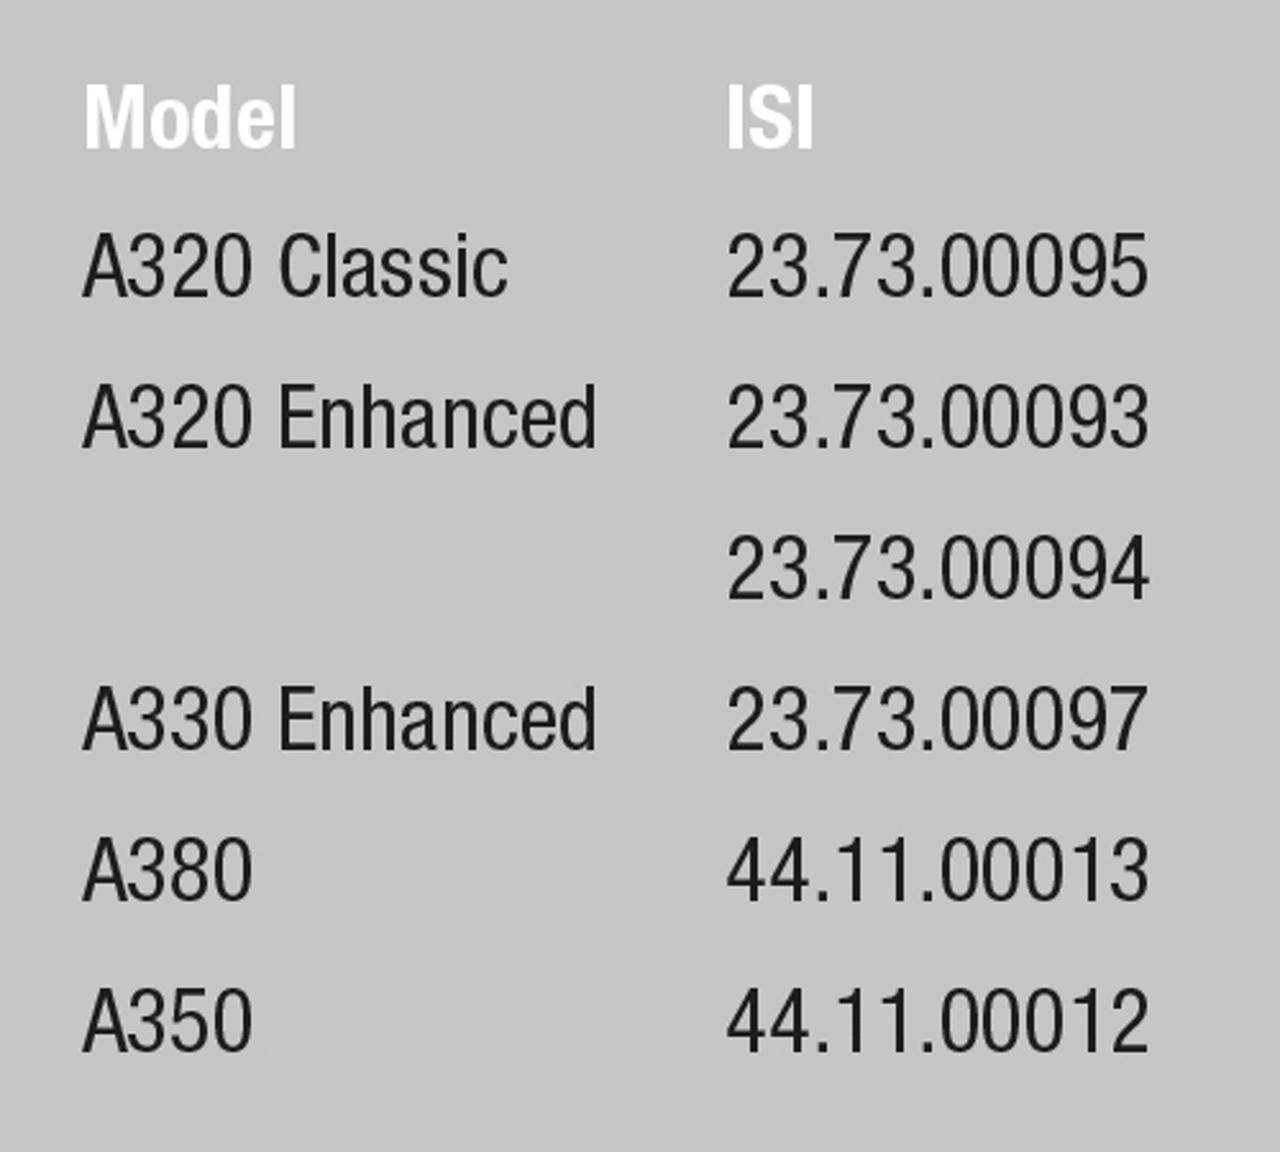 Model ISI